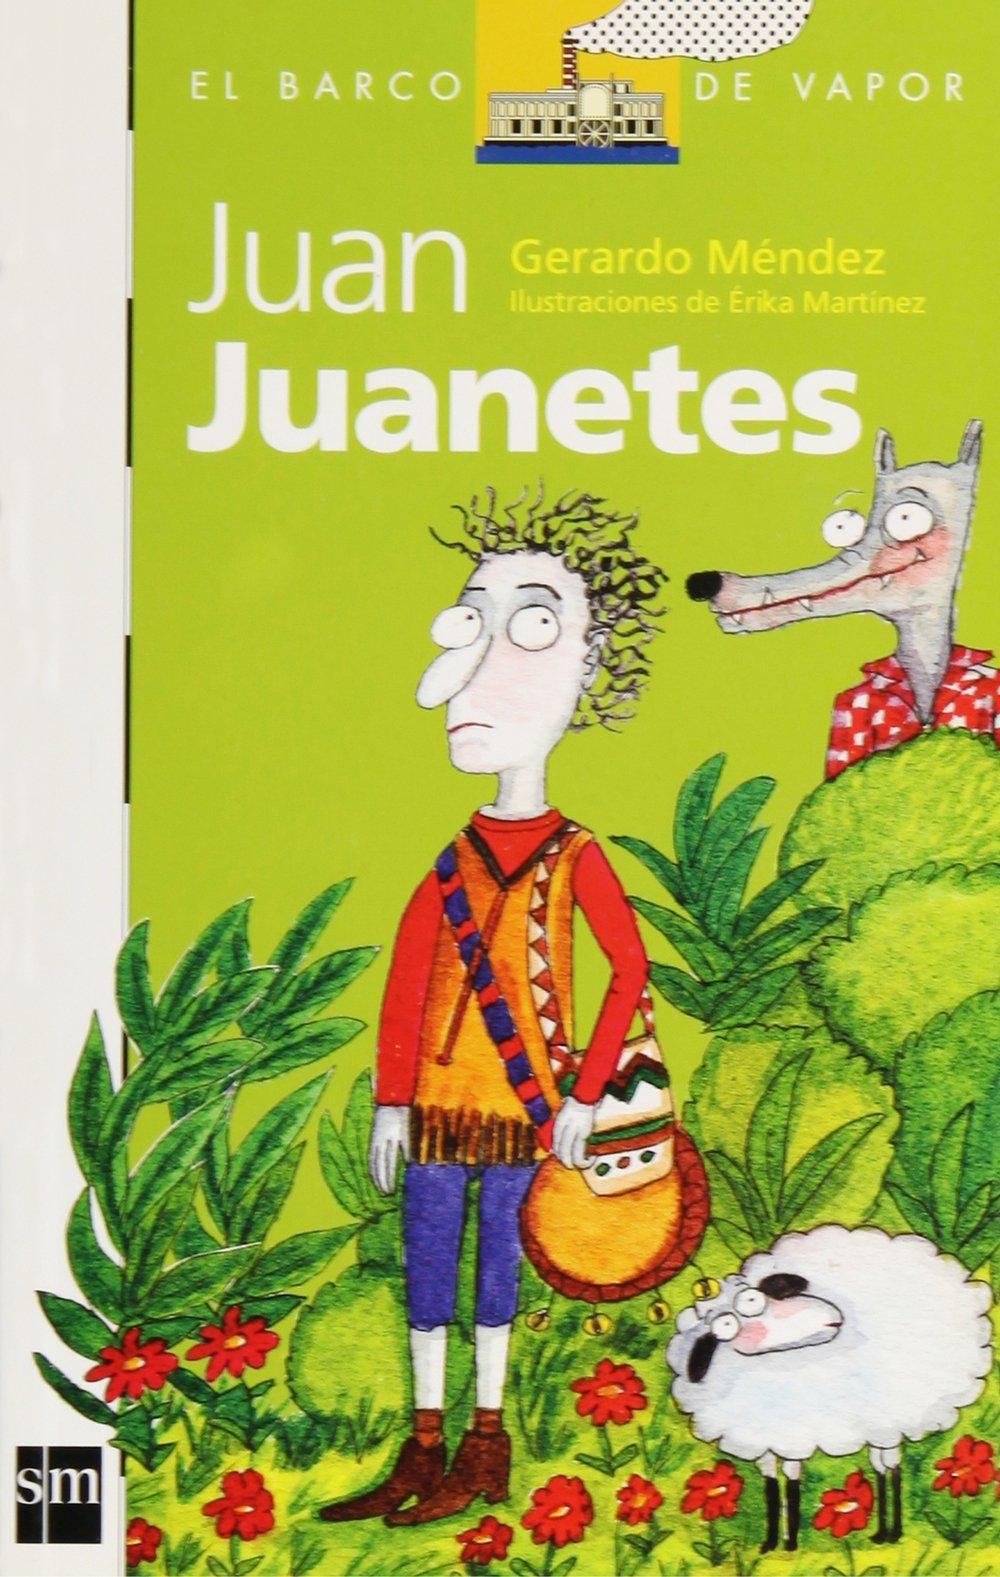 Juan Juanetes (El barco de vapor) (Spanish Edition) (Spanish) Paperback – October 30, 2004